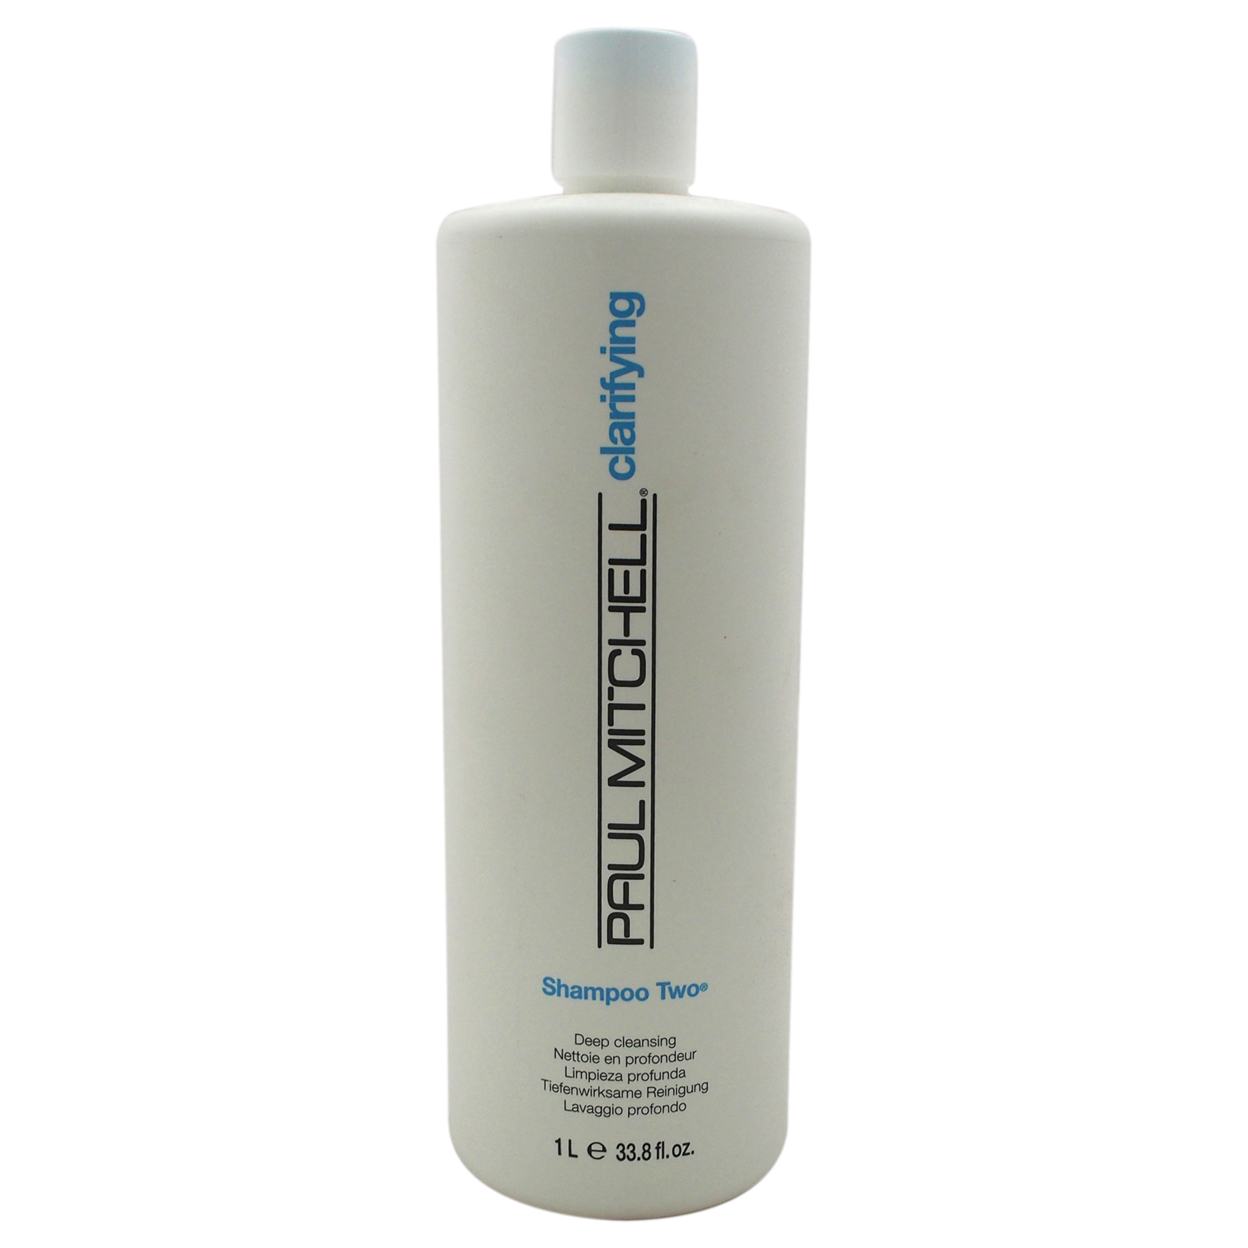 Shampoo Two by Paul Mitchell for Unisex - 33.8 oz Shampoo 5898e1c6c98fc450900ecefc